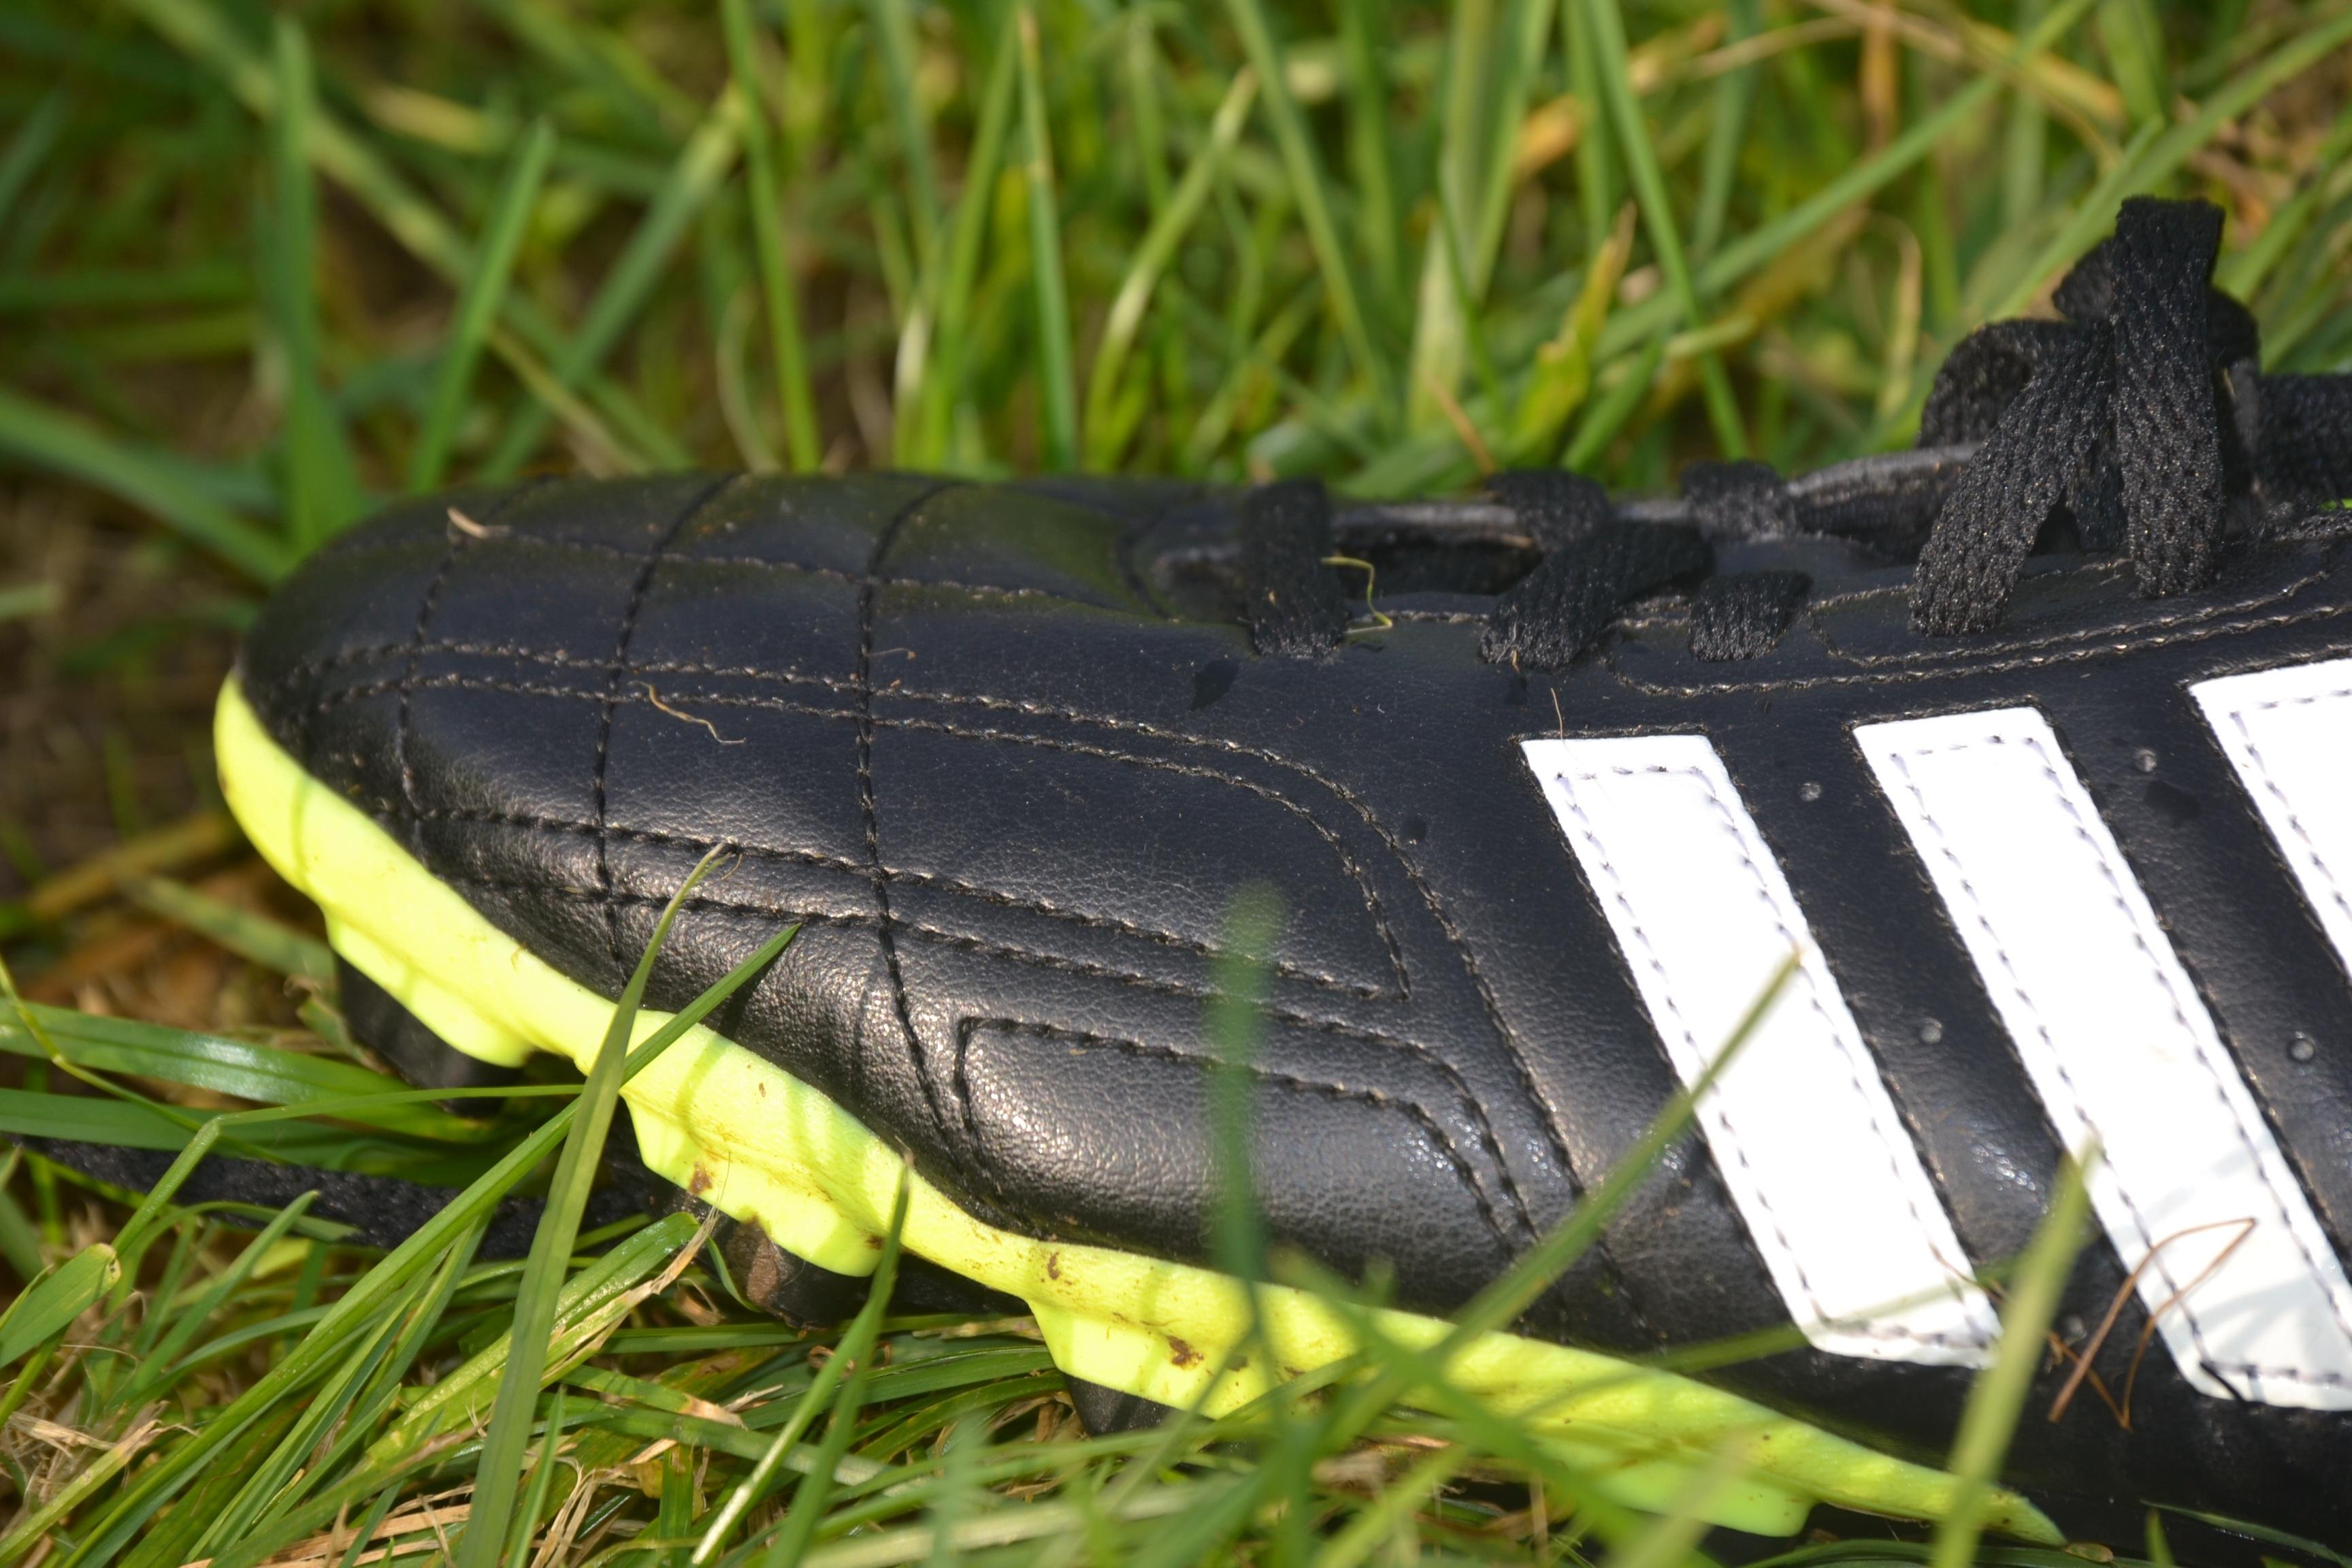 mano césped zapato deporte césped verde fútbol neumático Adidas calzado  zapatos deportivos botas de fútbol Neumático 08f7d13401011